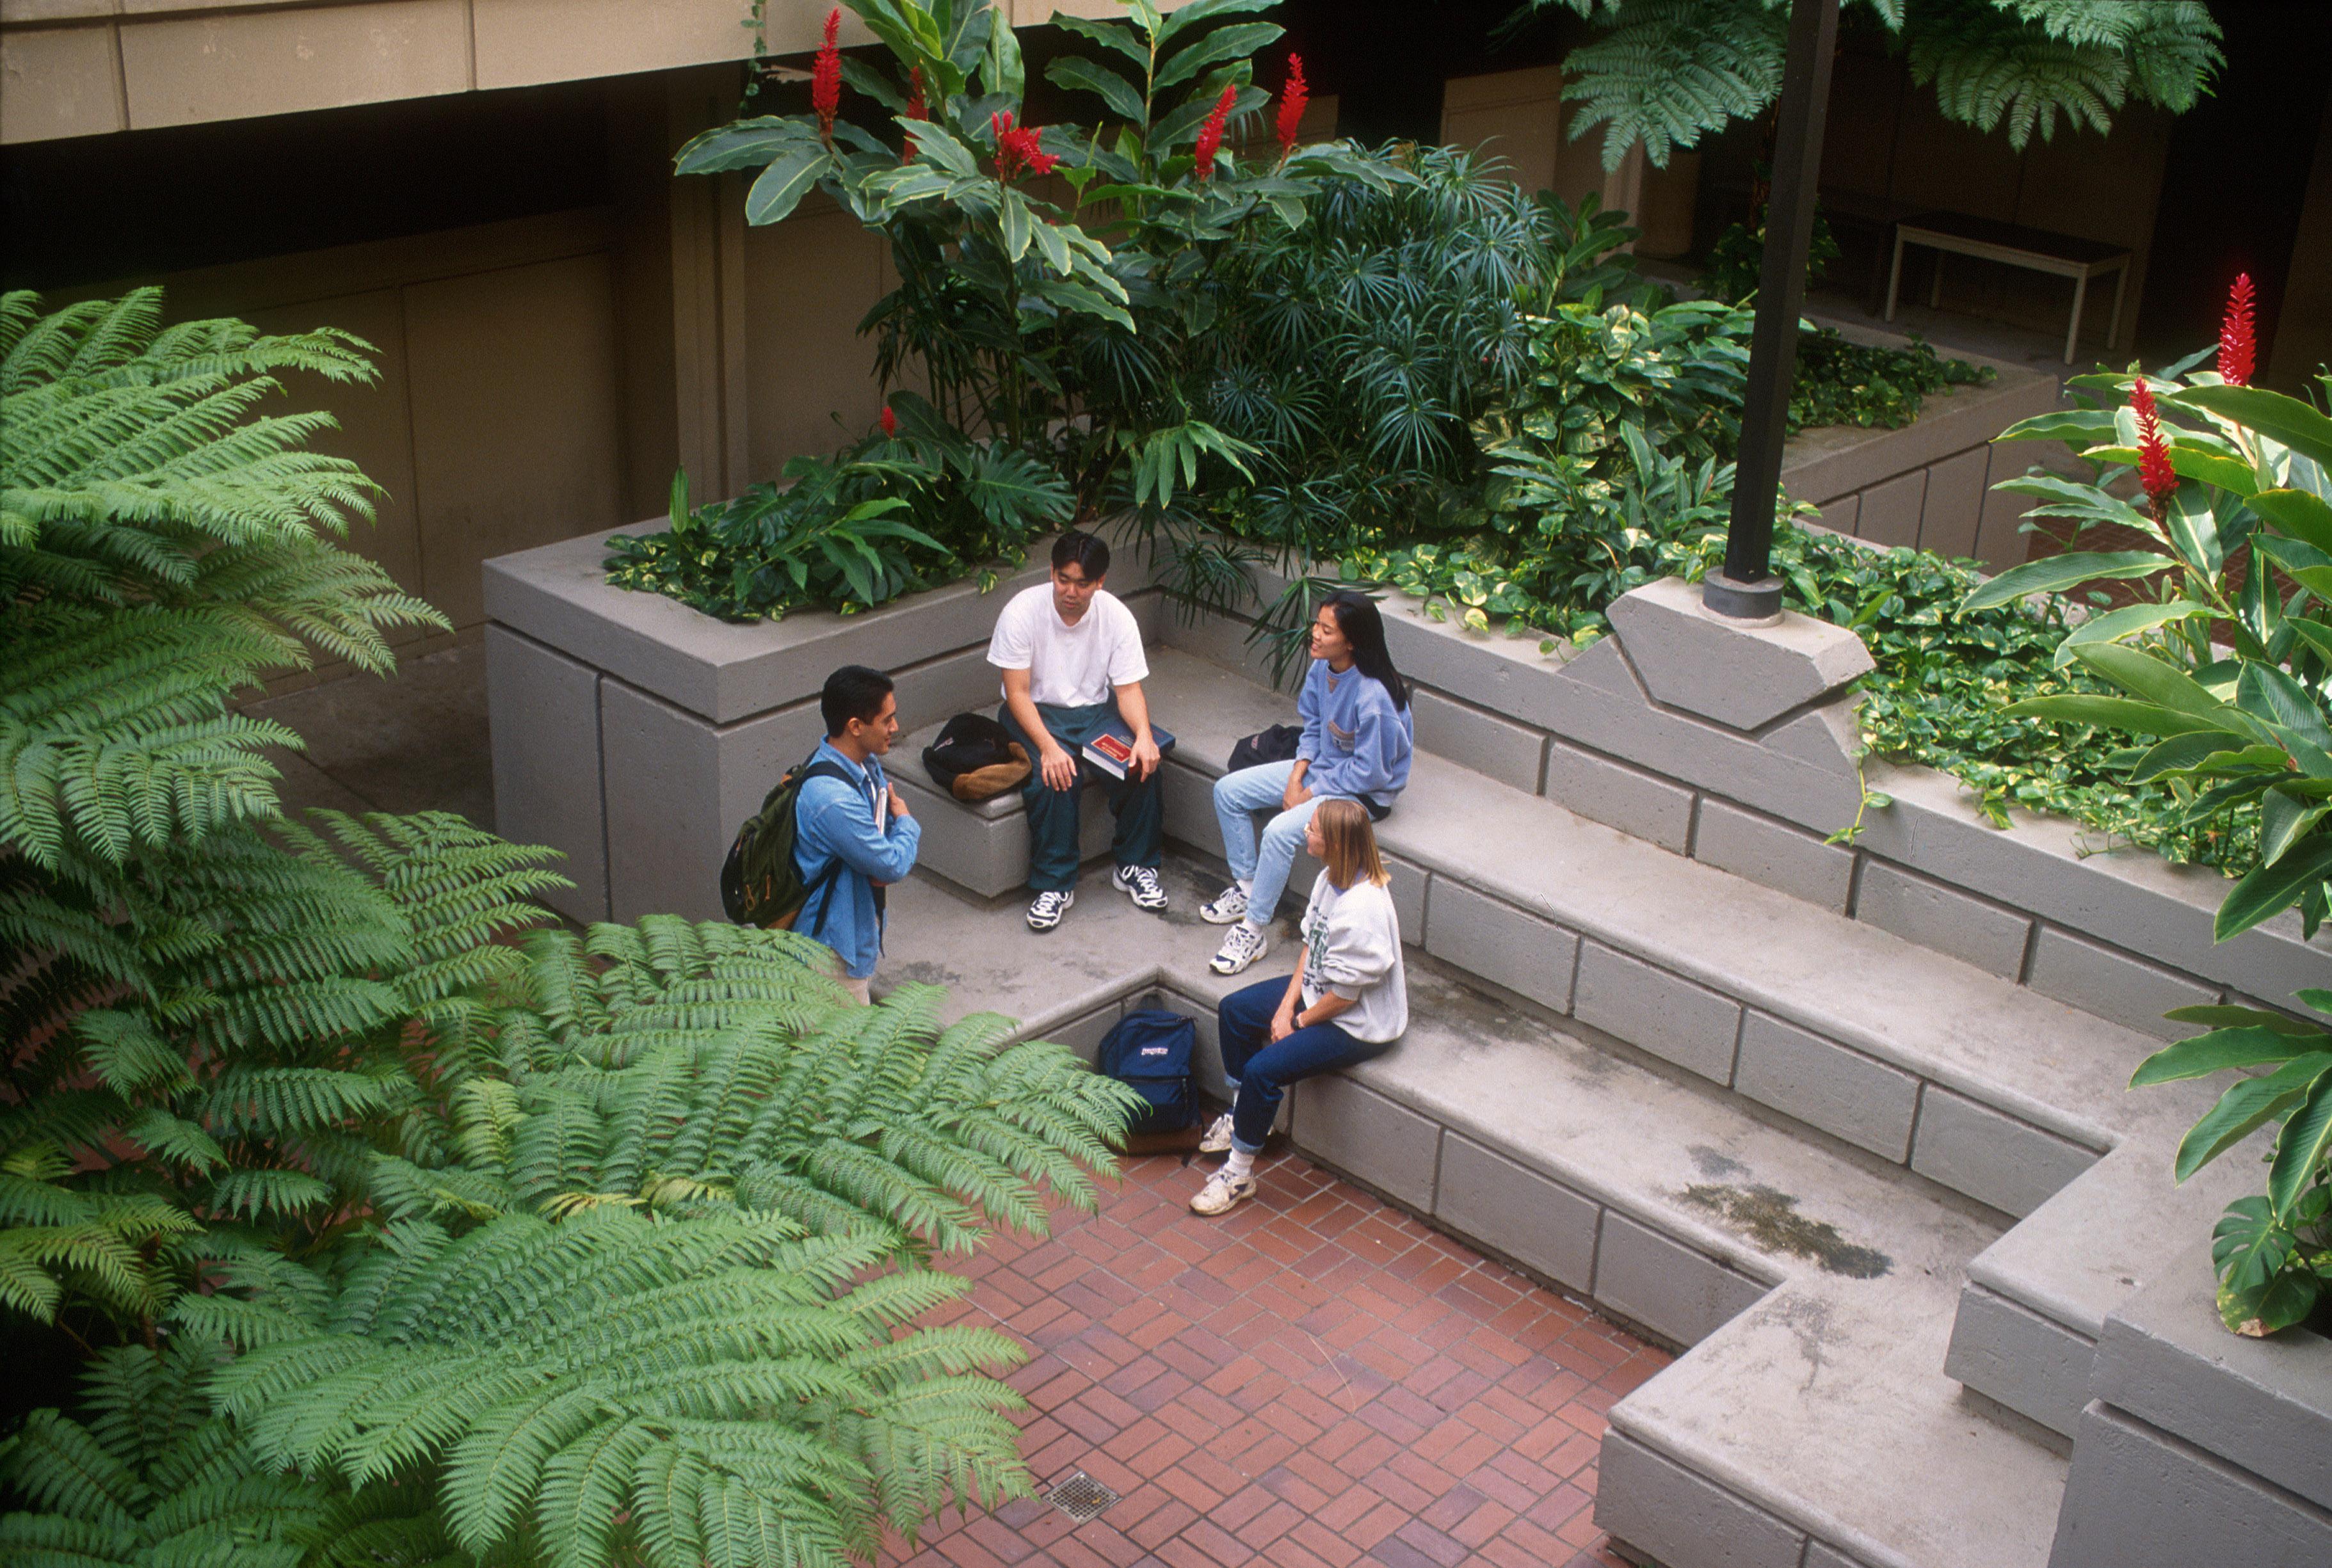 Law school courtyard